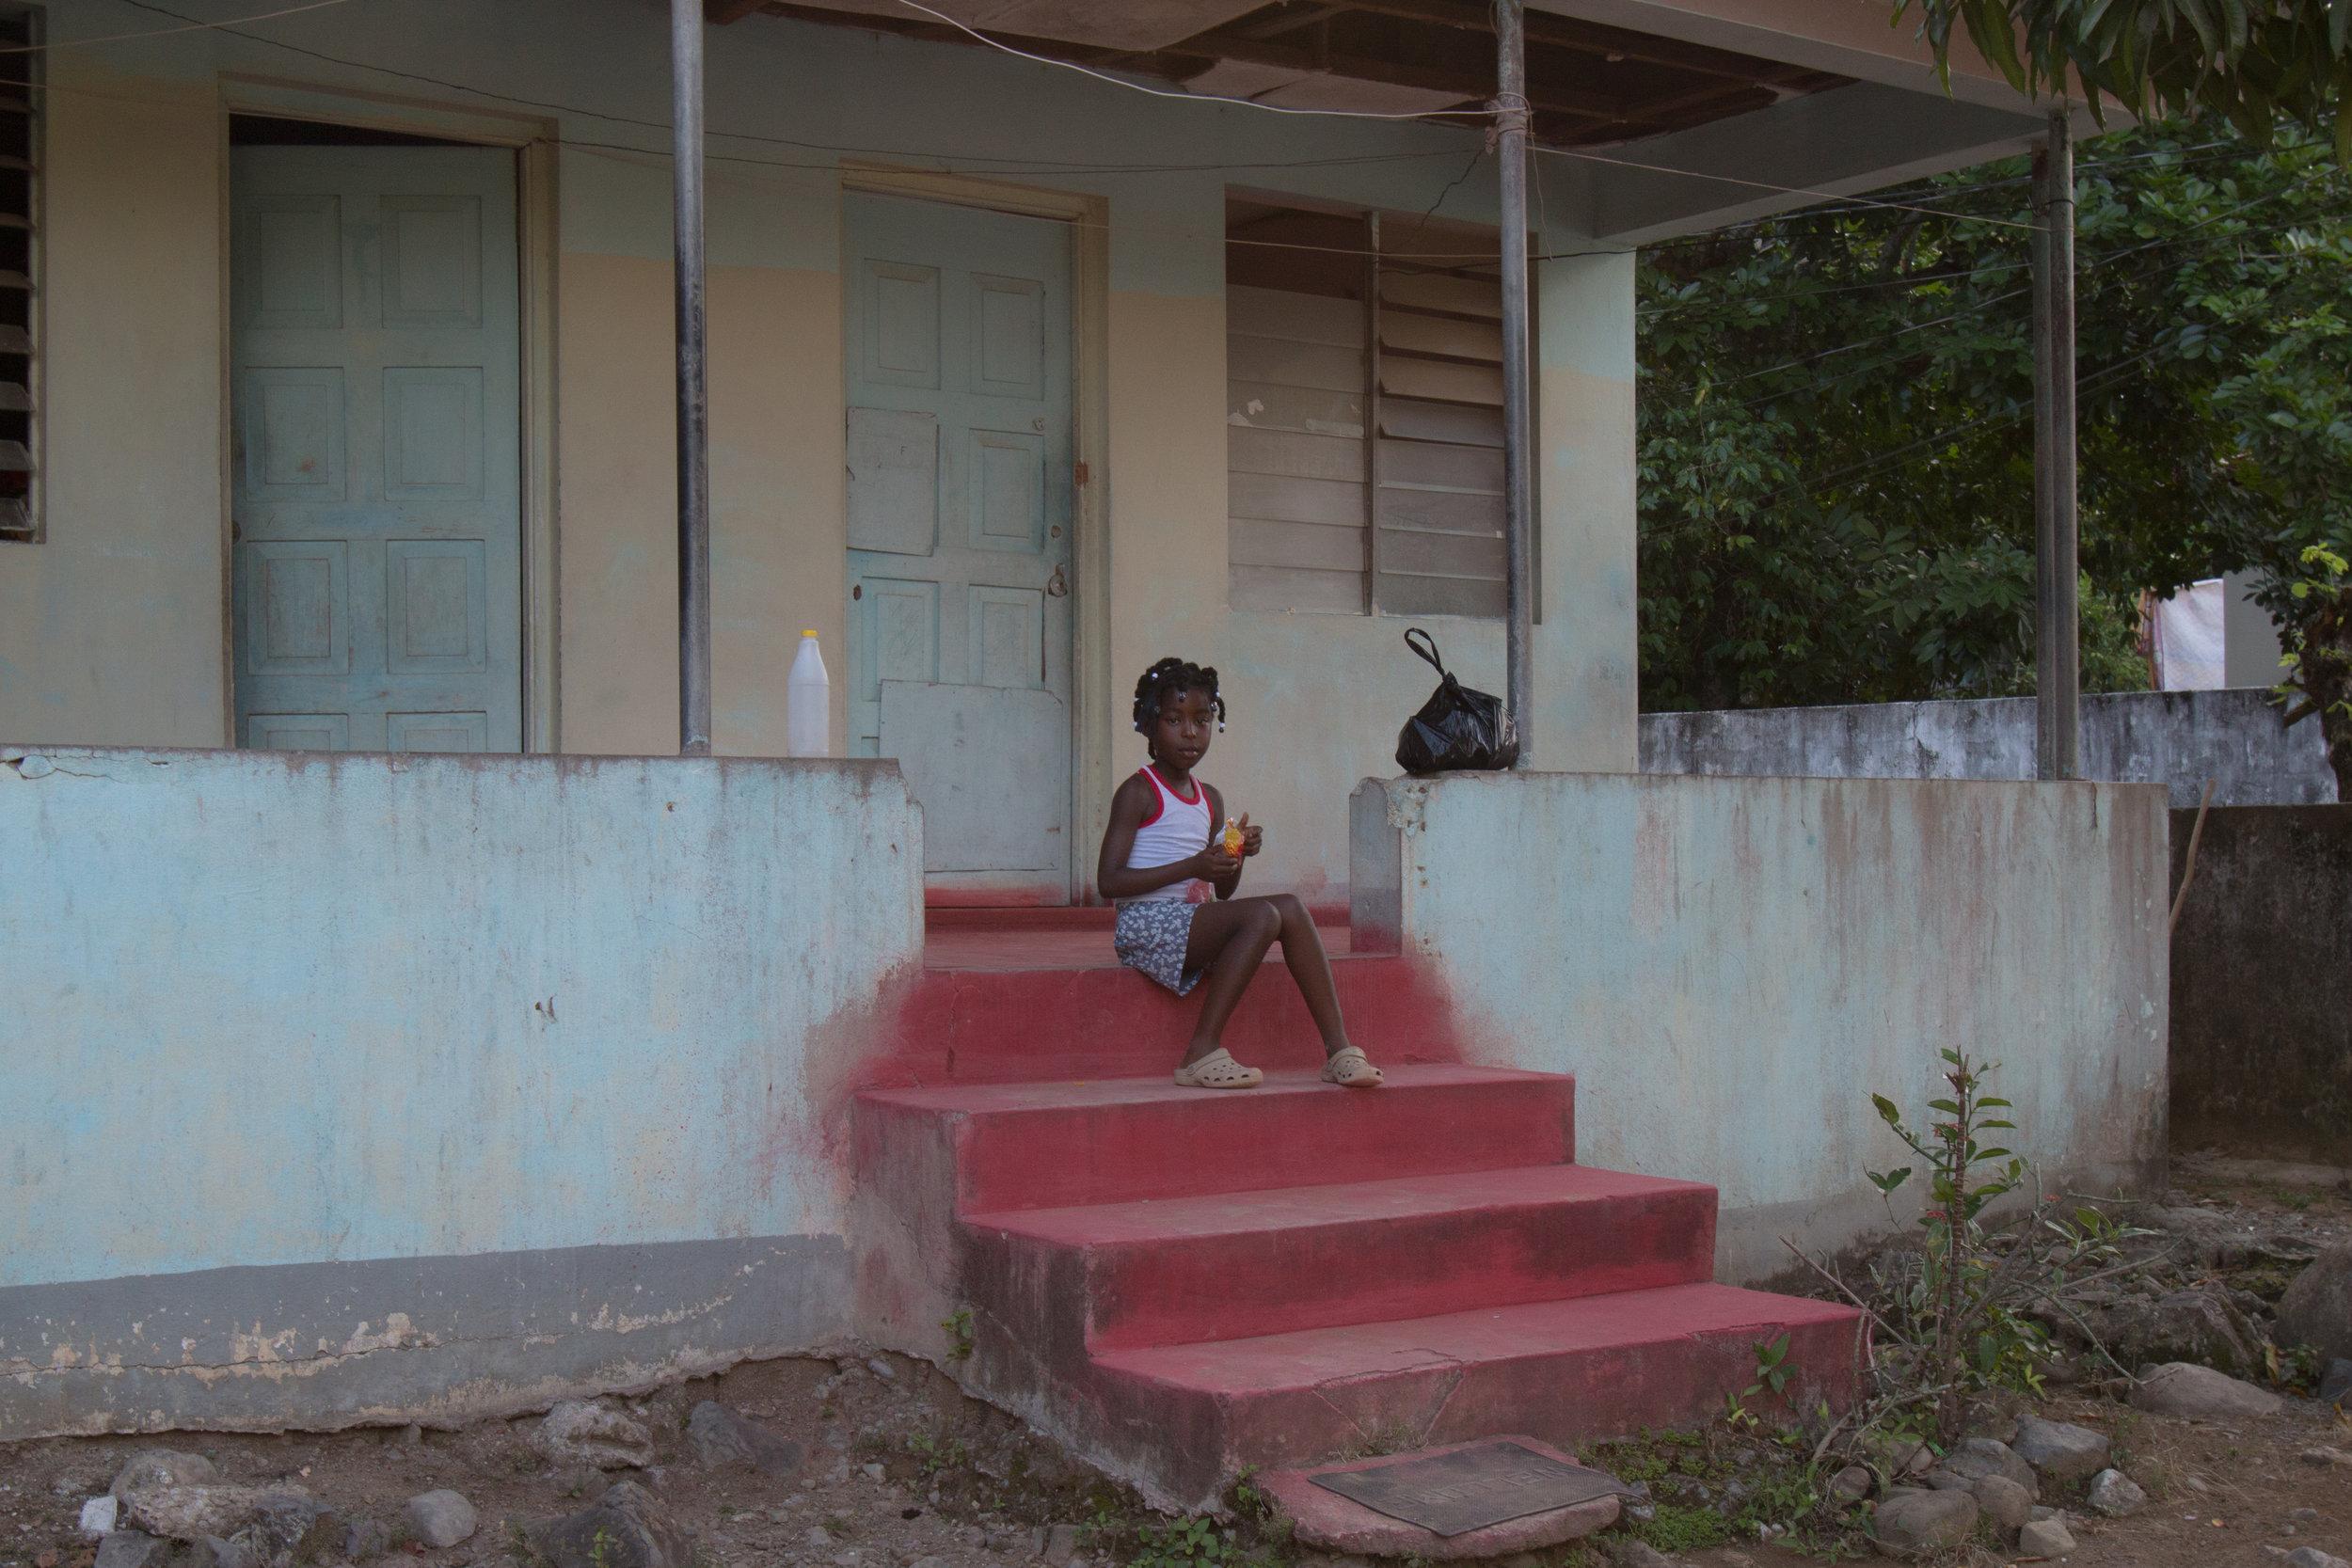 Jamaica edits for blog-30.jpg